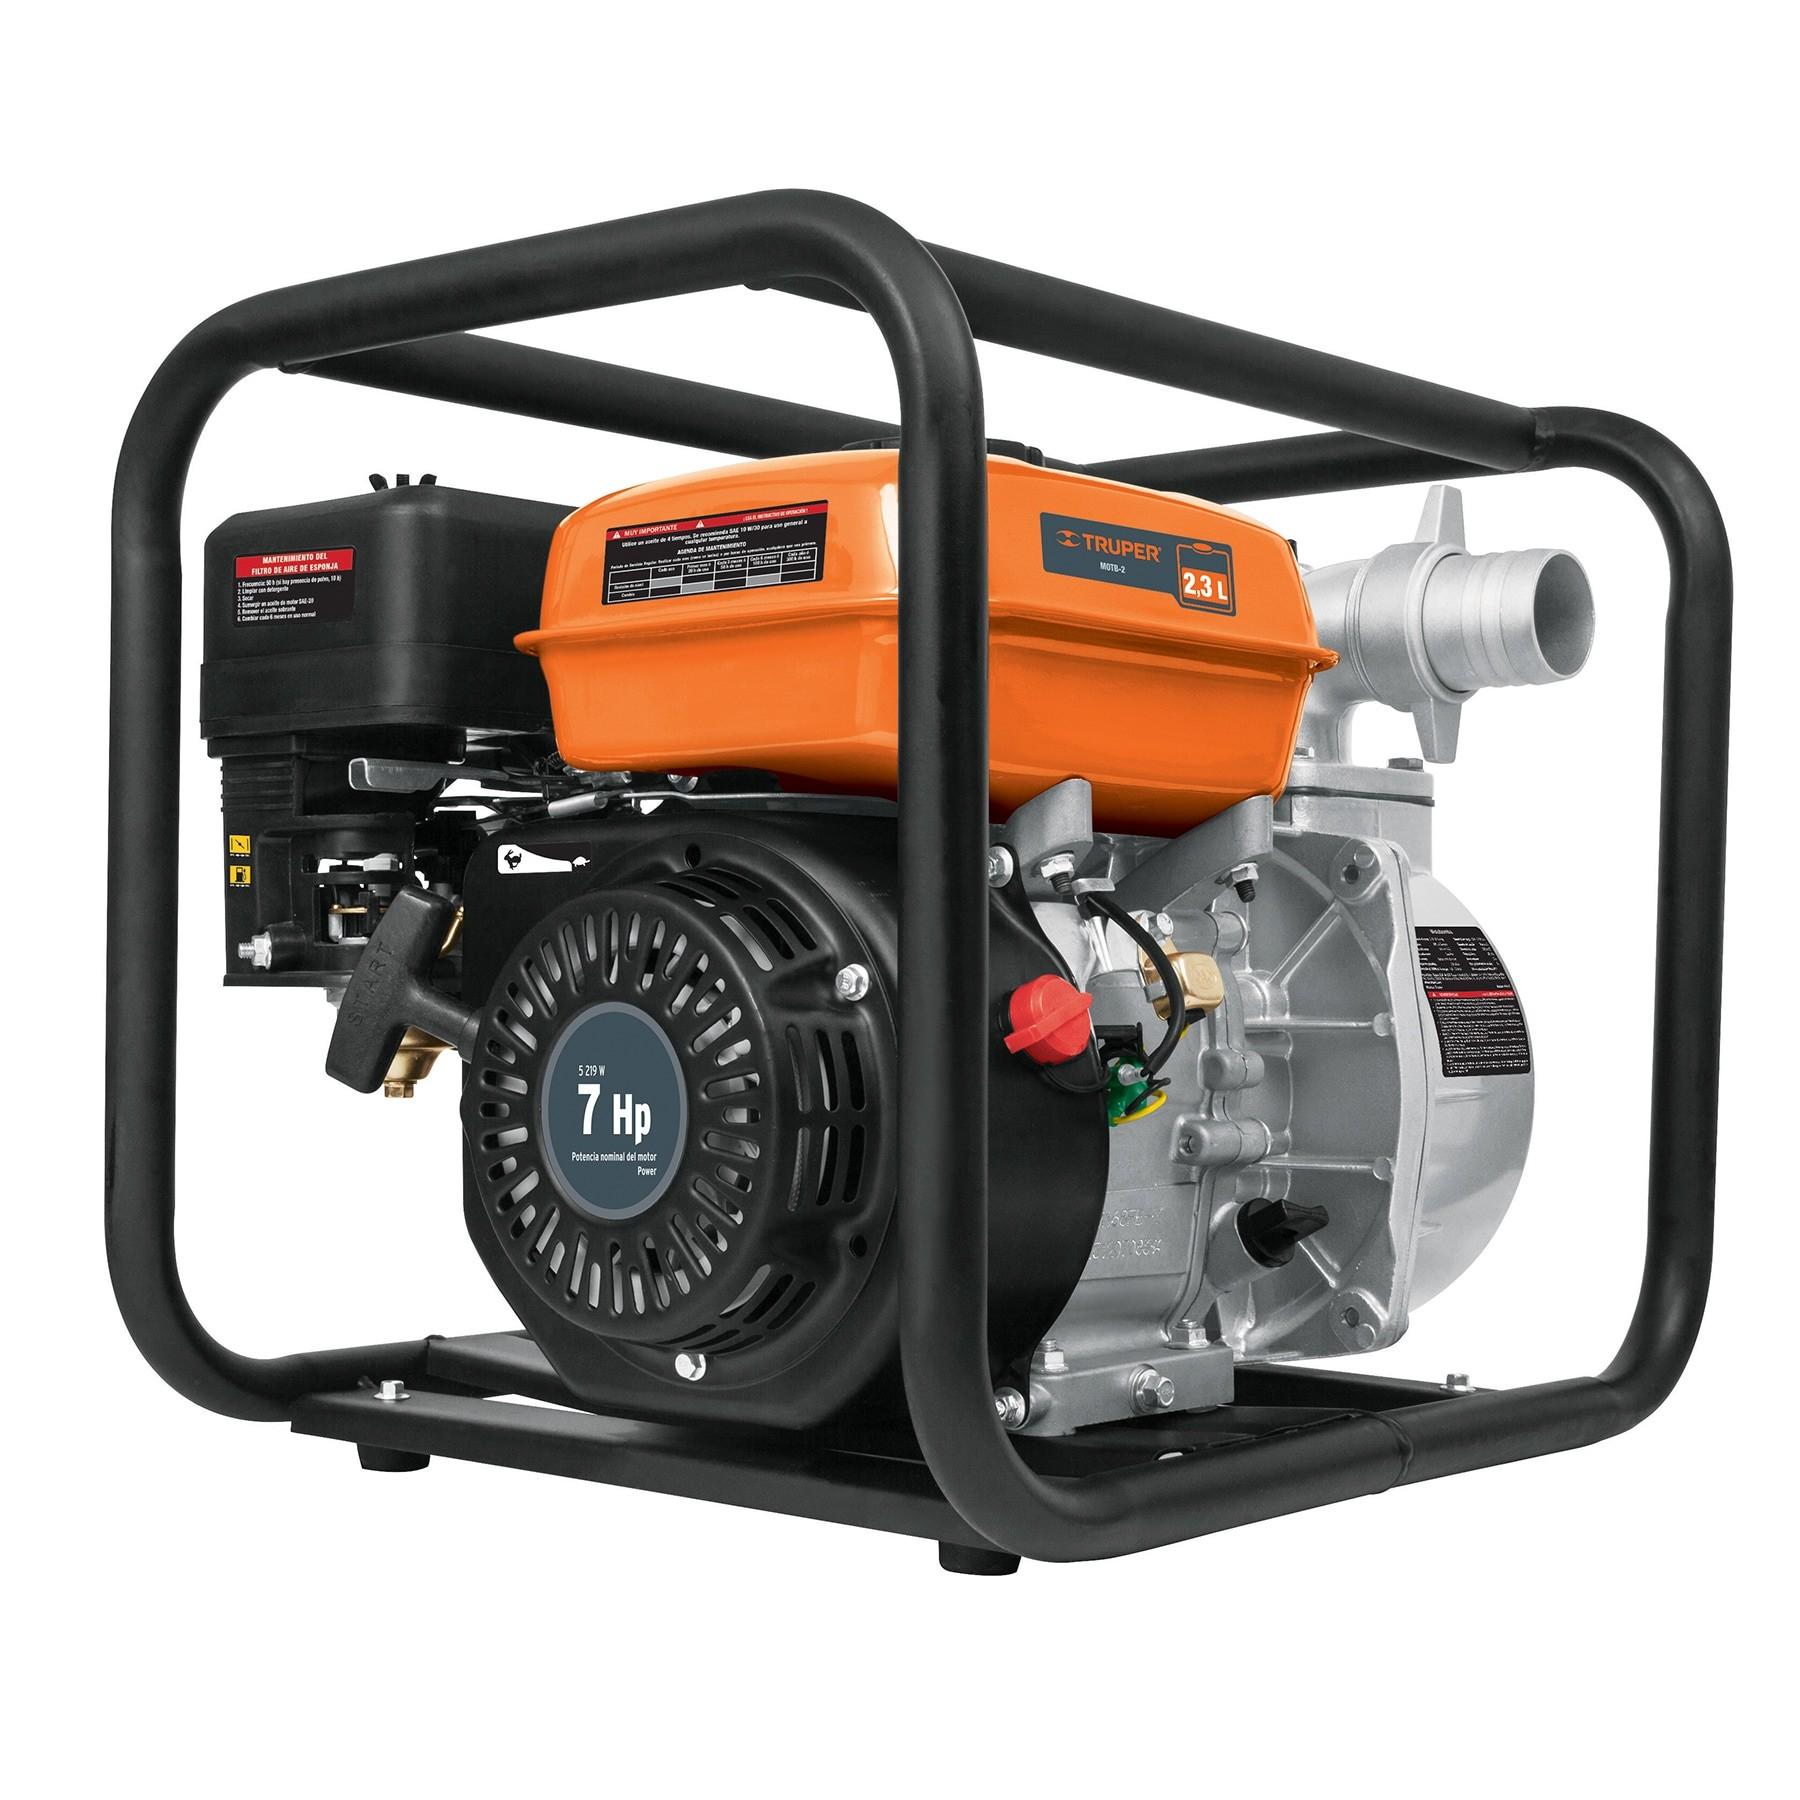 "Motobomba autocebante 2x2"", 7 HP, a gasolina"